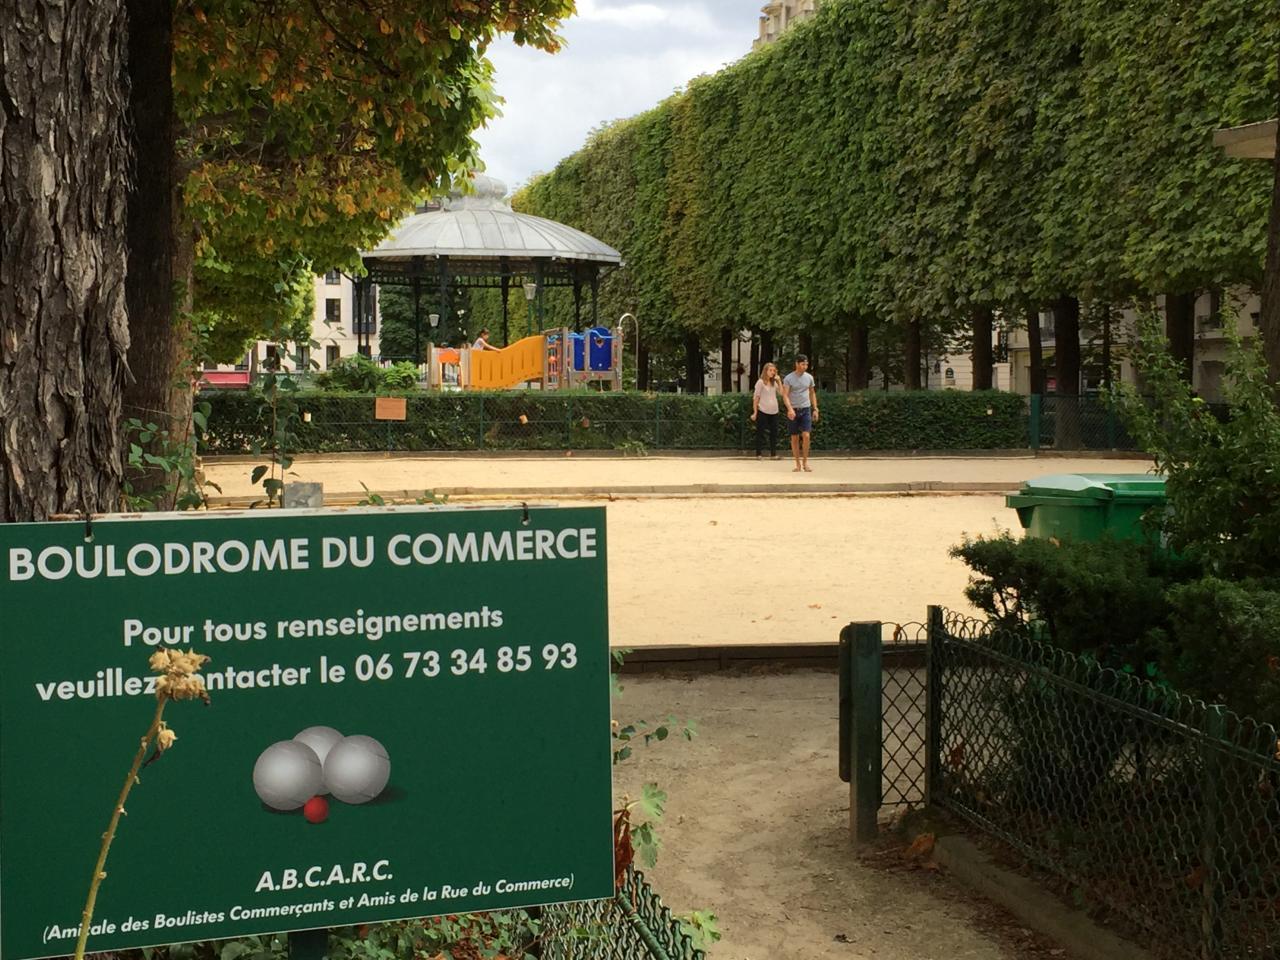 Il n'y a pas qu'à Marseille où l'on joue aux boules !